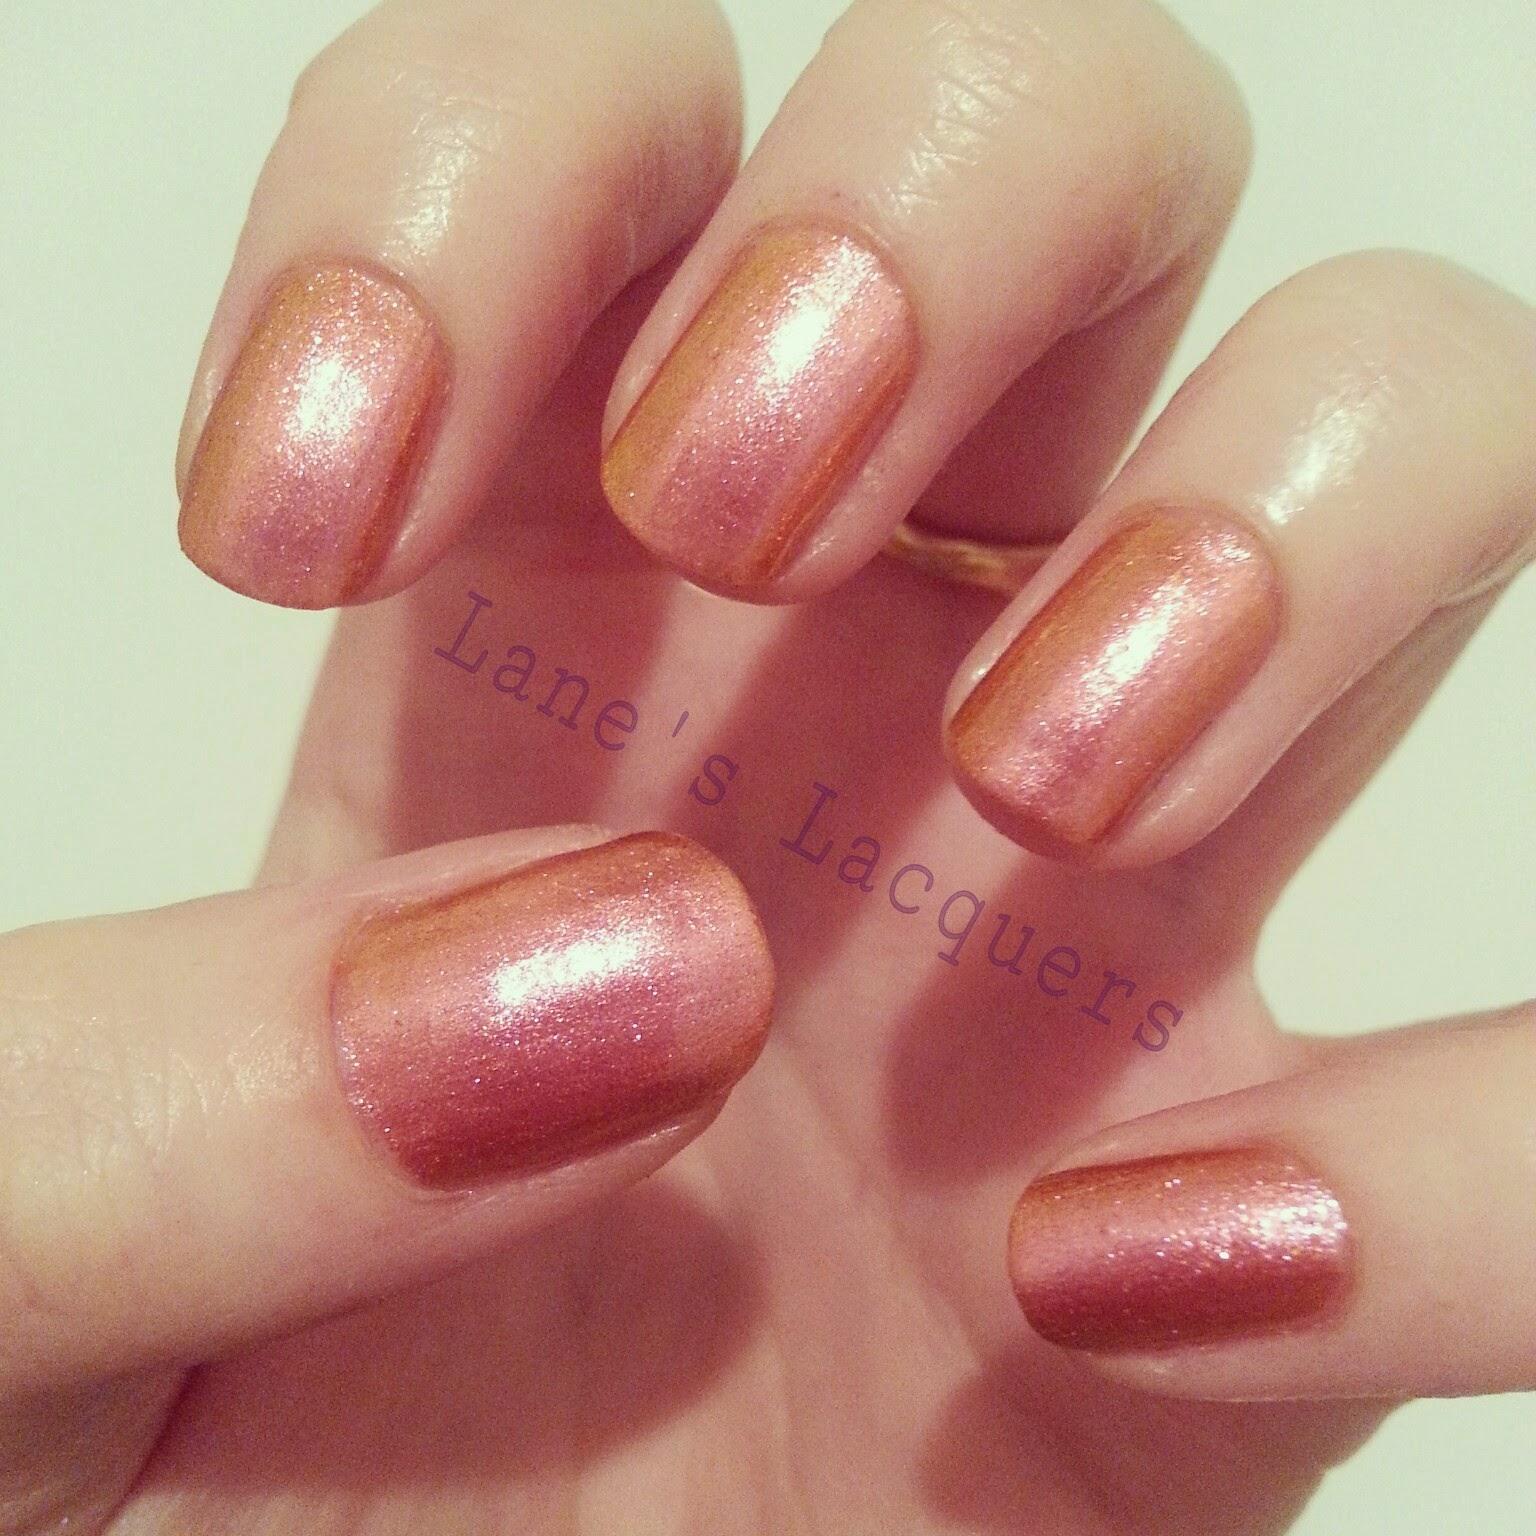 barry-m-aquarium-pink-aqnp4-swatch-manicure